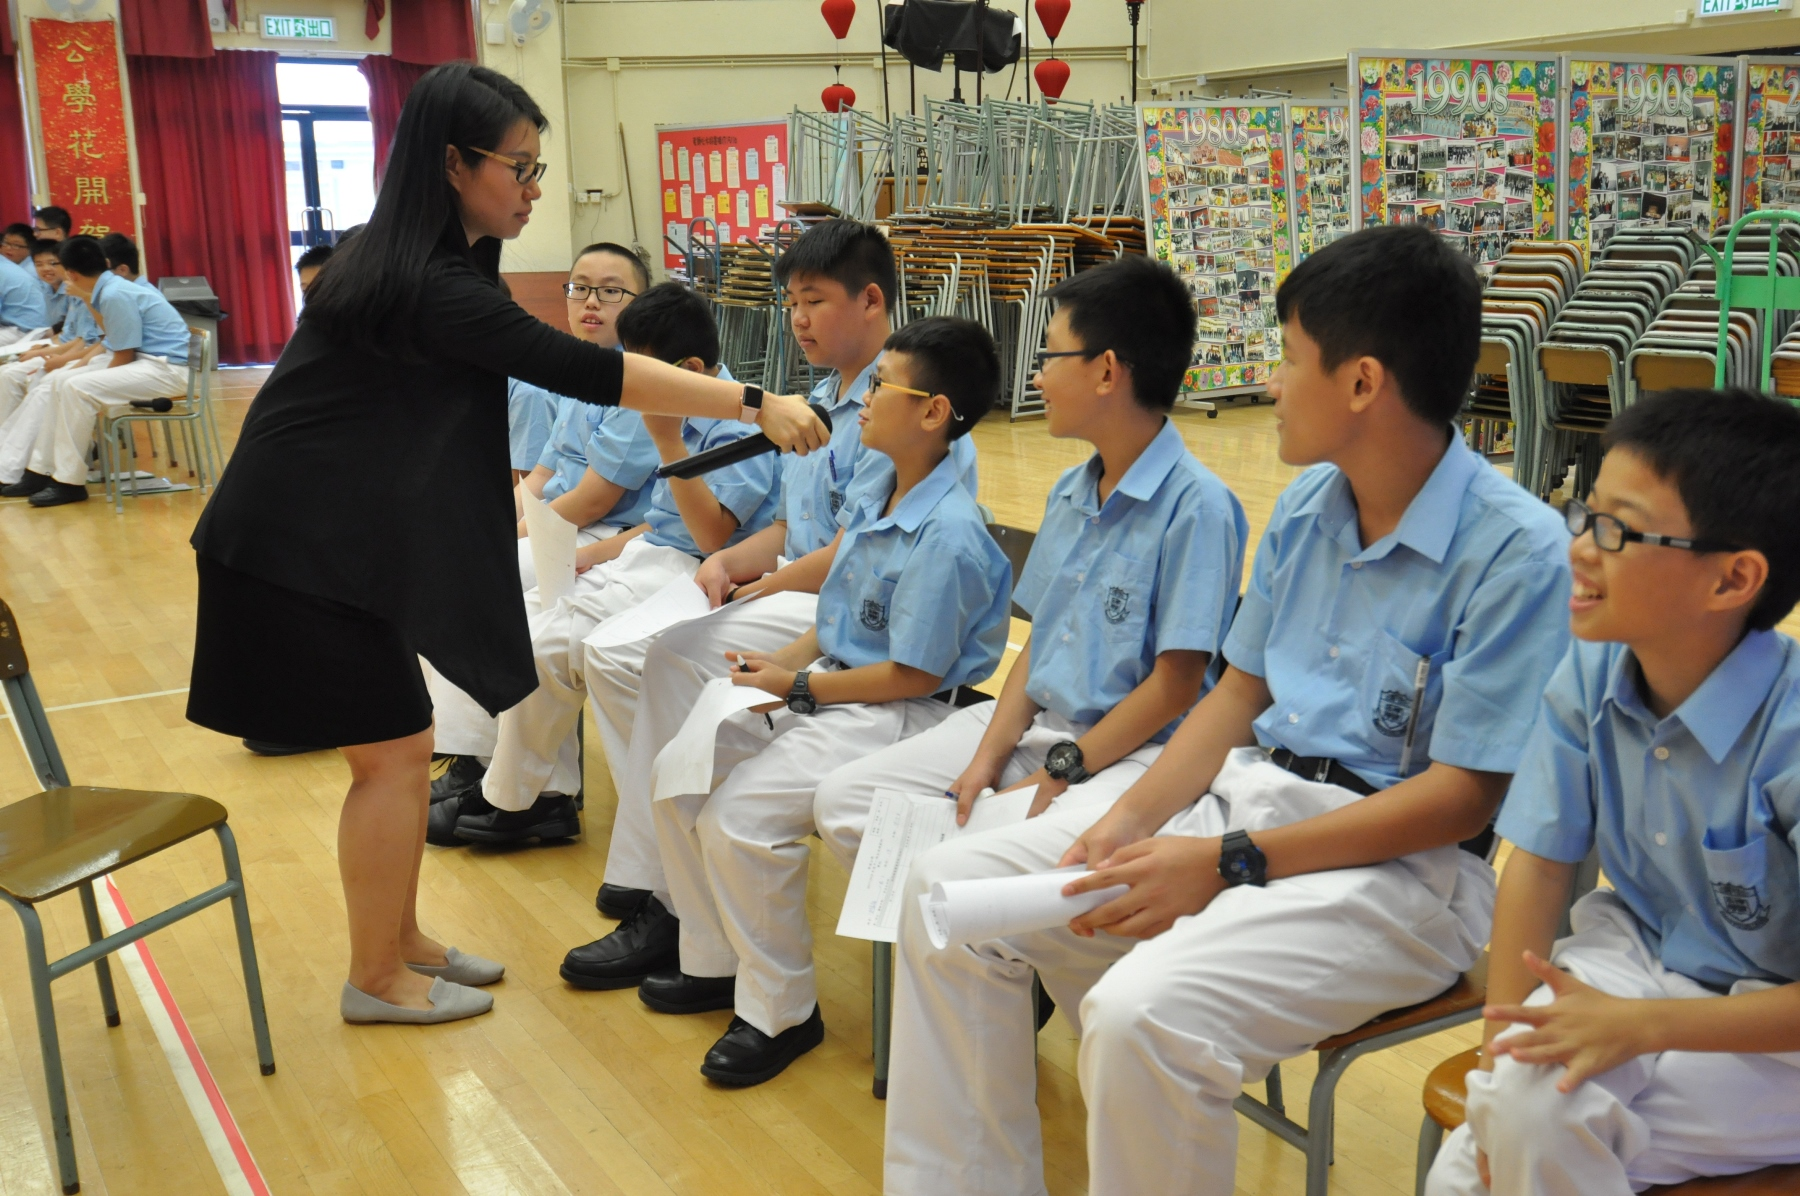 http://www.npc.edu.hk/sites/default/files/dsc_0197.jpg